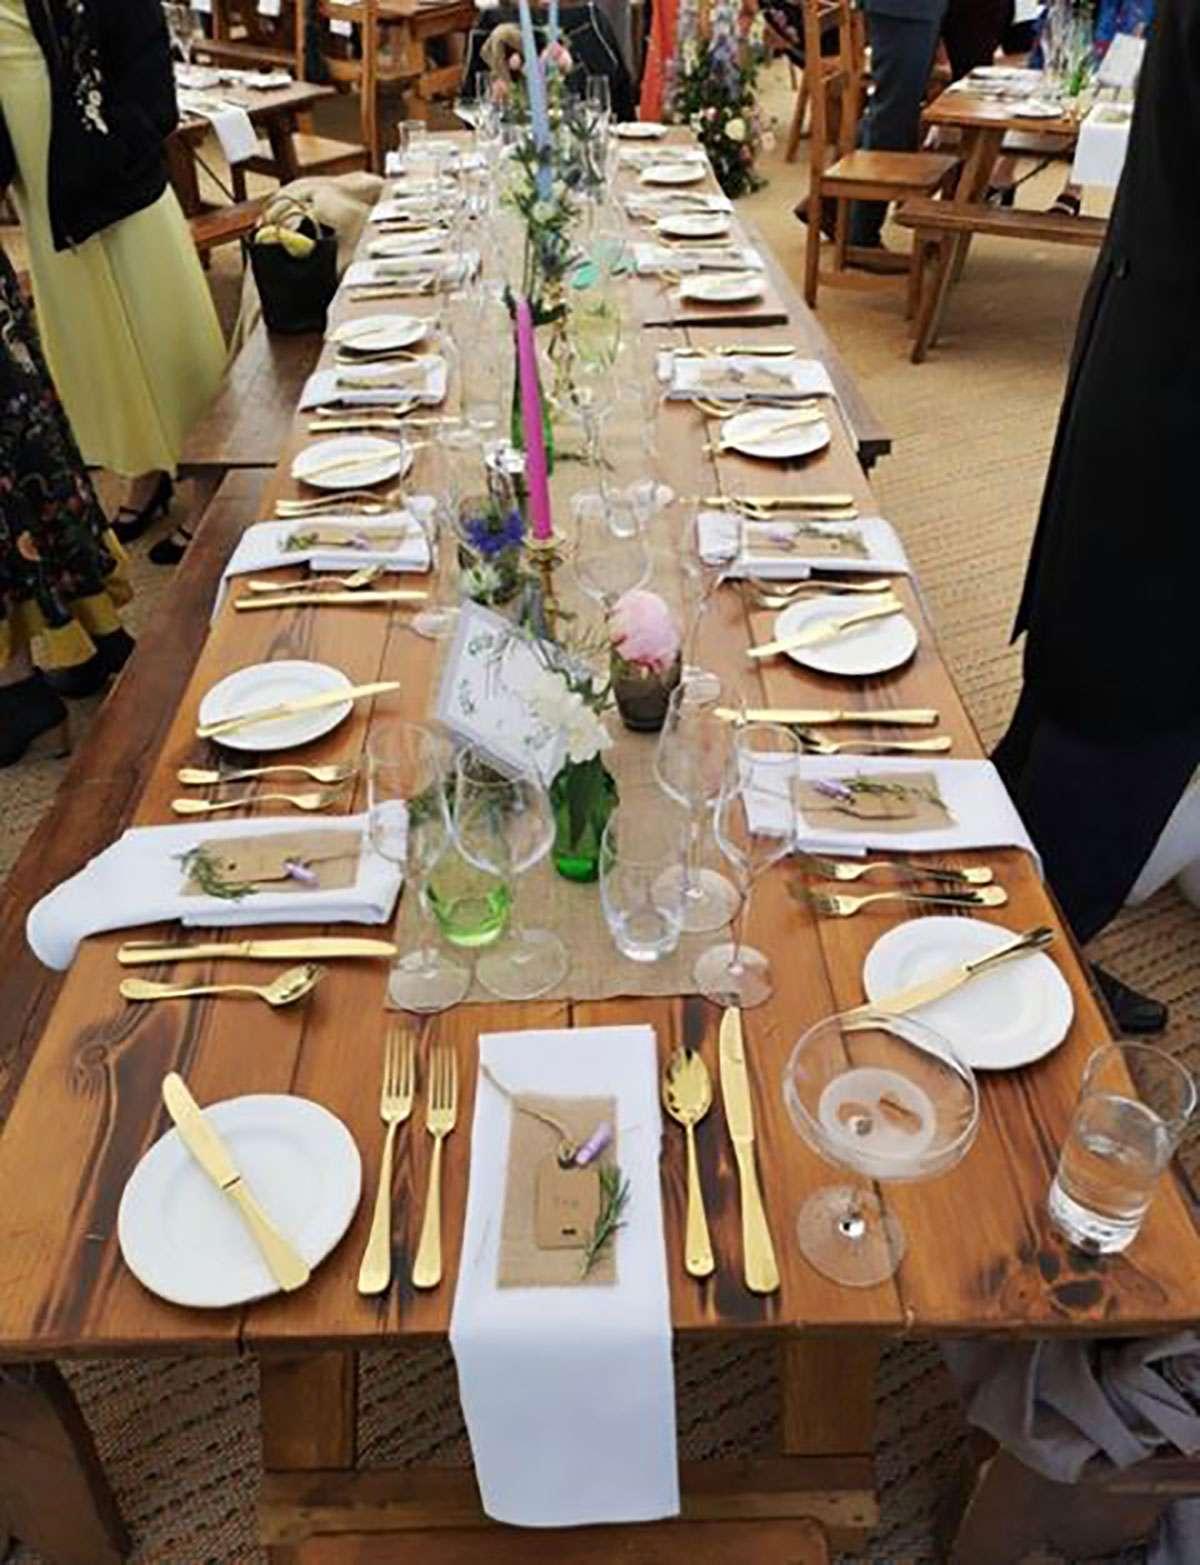 long table with setup for wedding meal